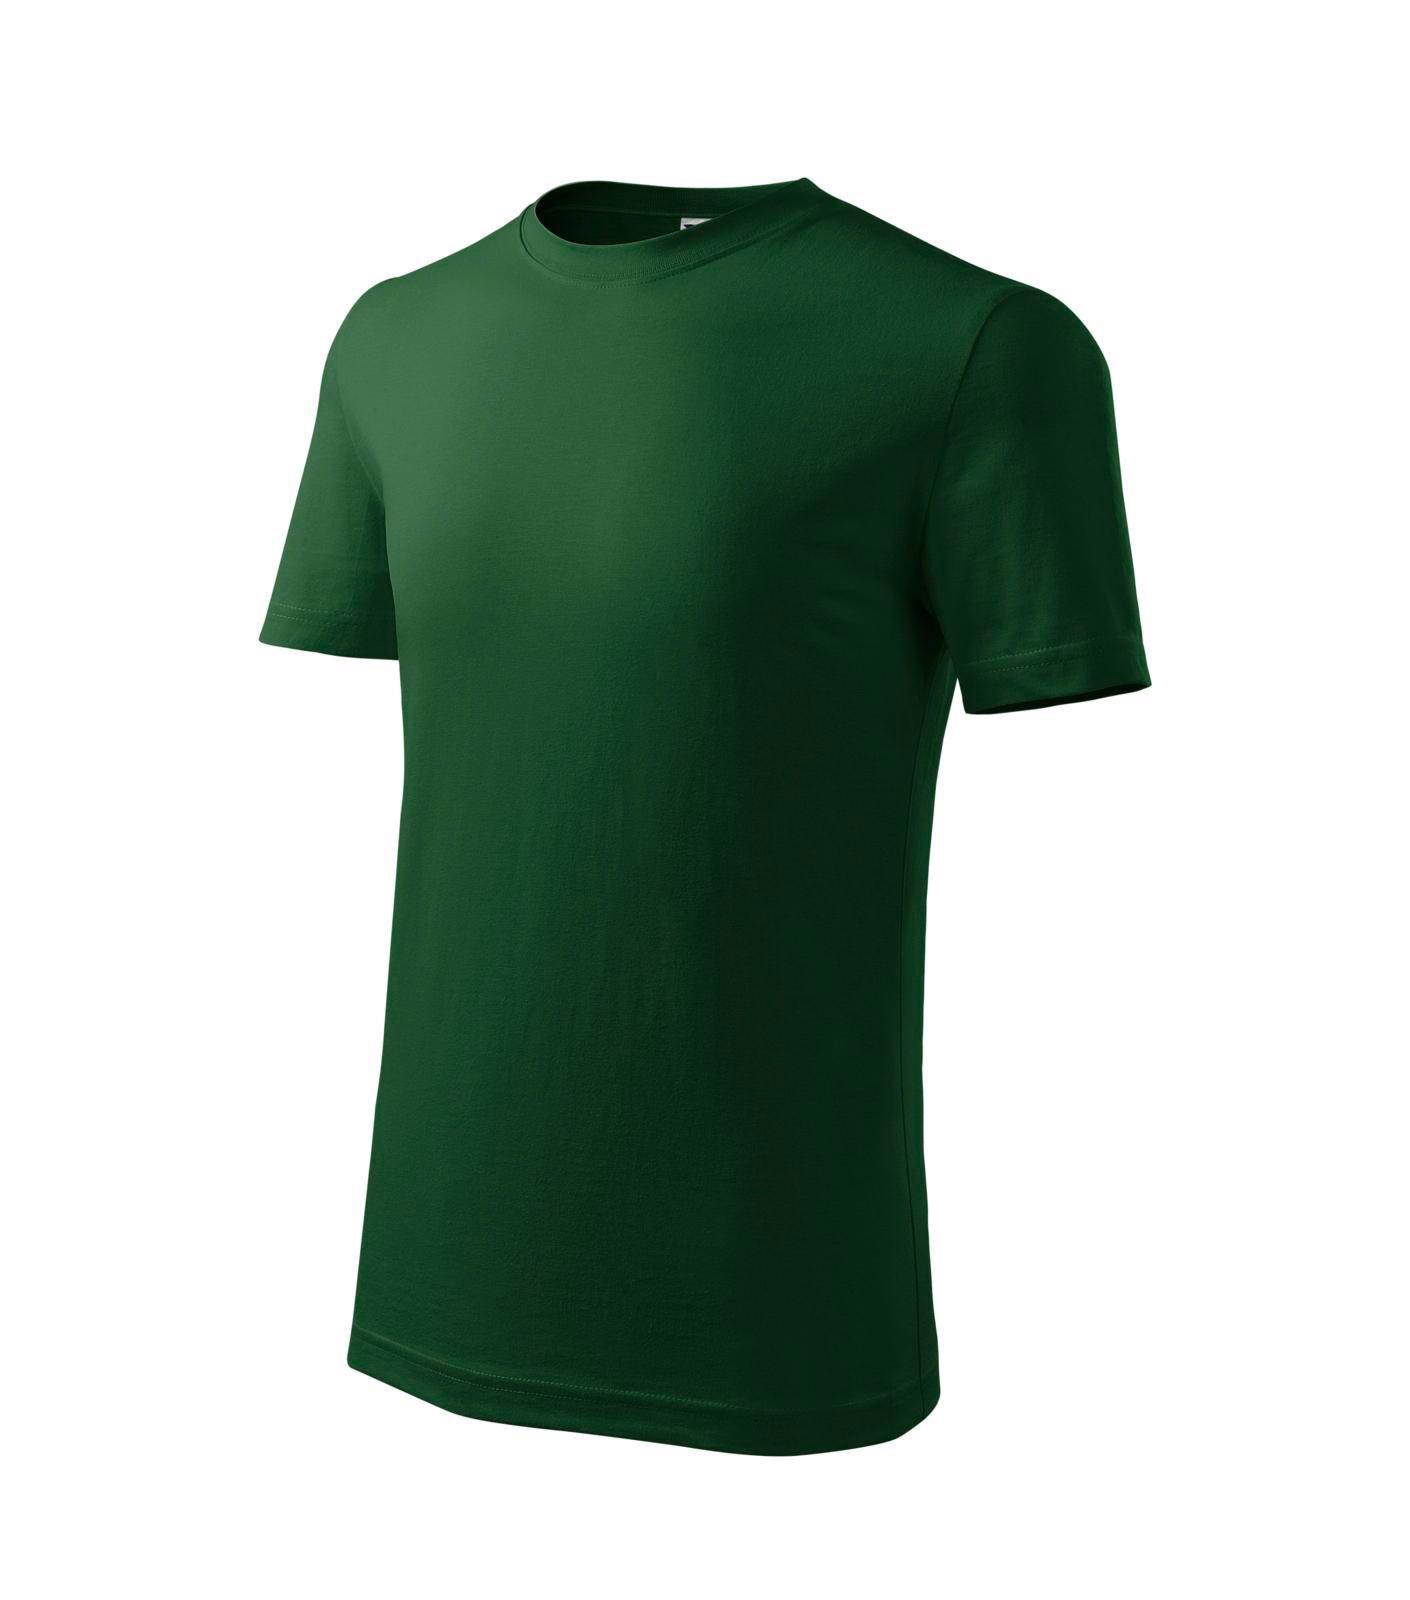 T-shirt Kids Malfini Classic New - Bottle Green / 8 years